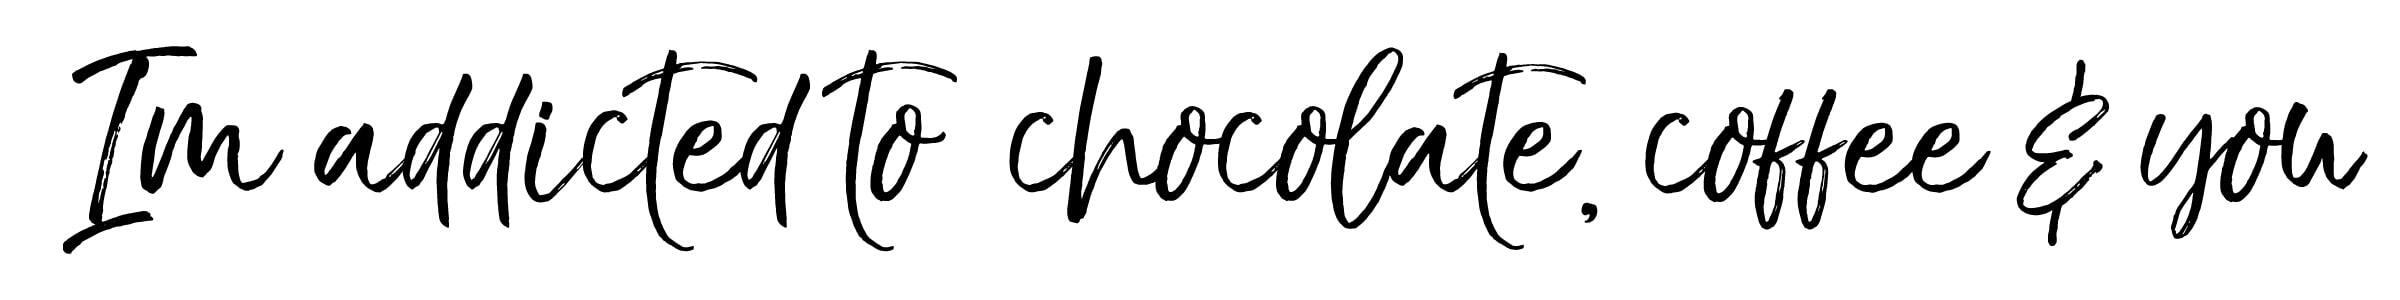 Schokolade_2400x300